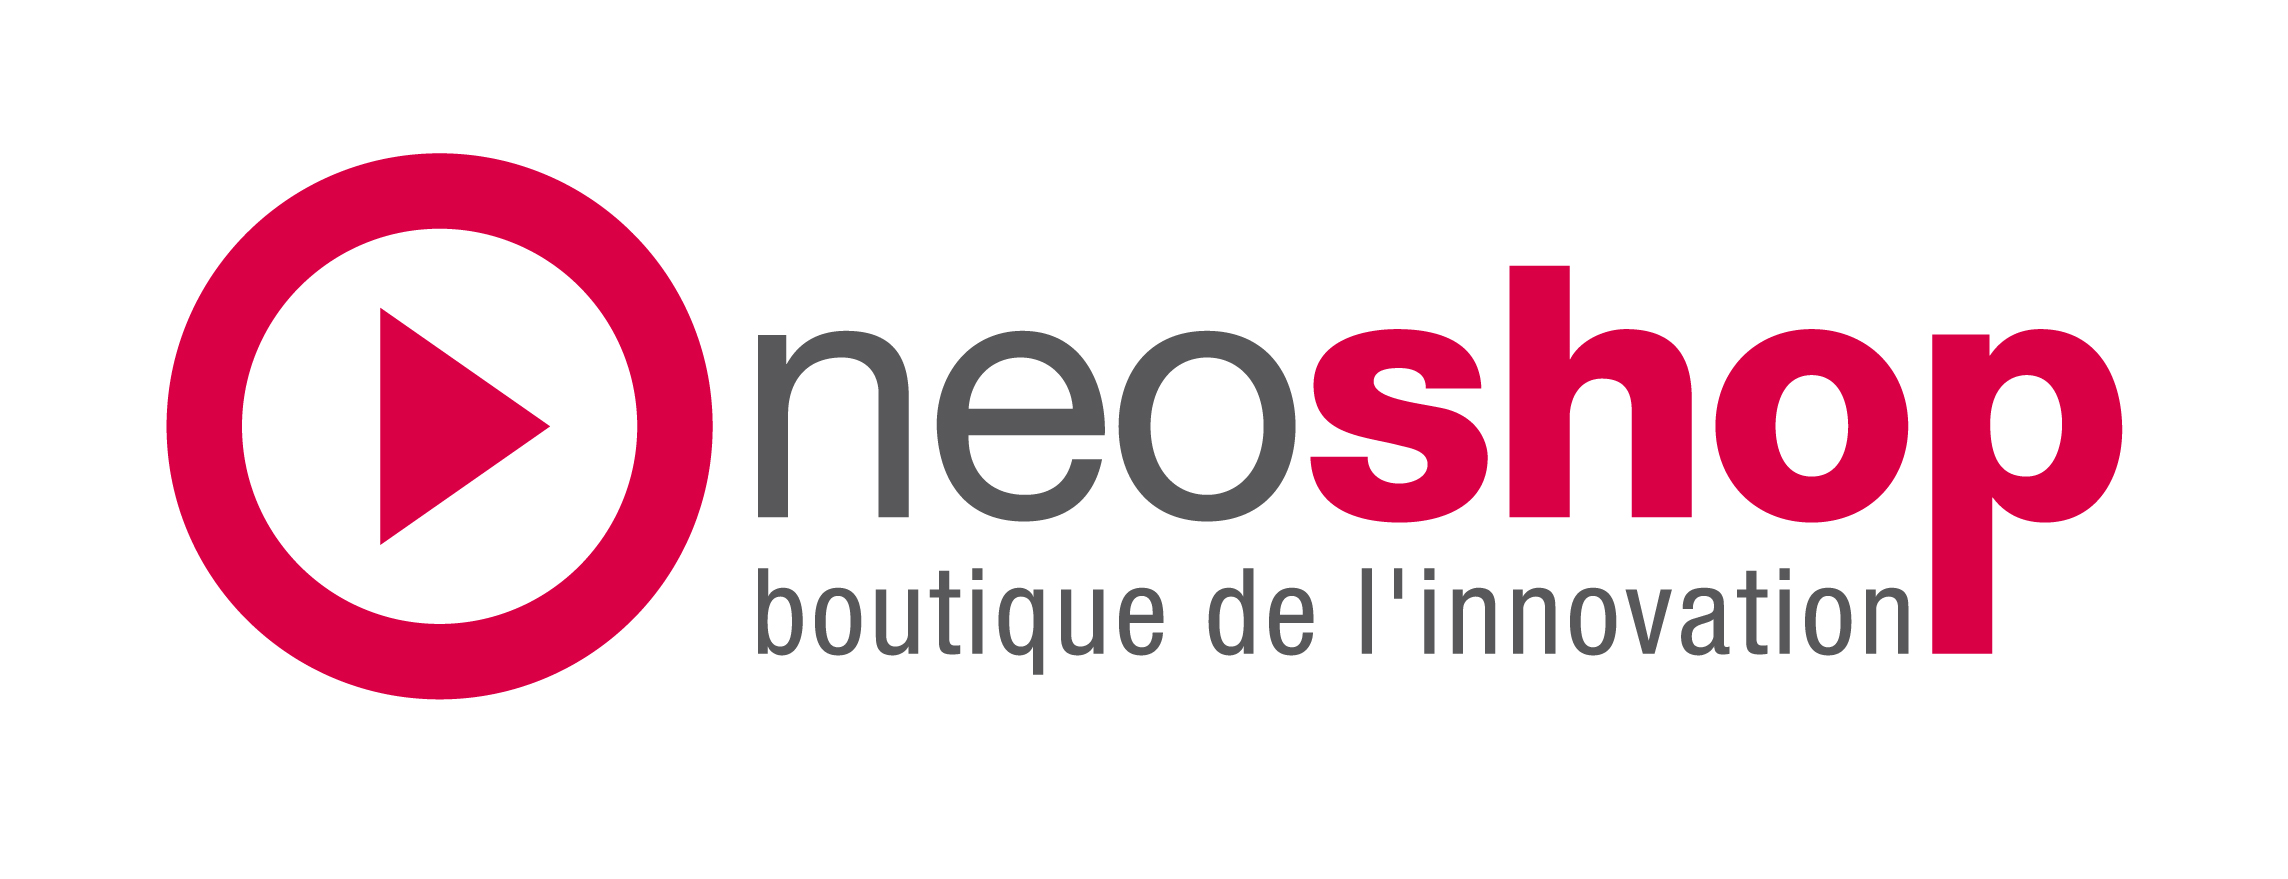 logo-neoshop-rectangle-fond-blanc-boutique-de-l-innovation-hd-jpeg_1394207886456-jpg